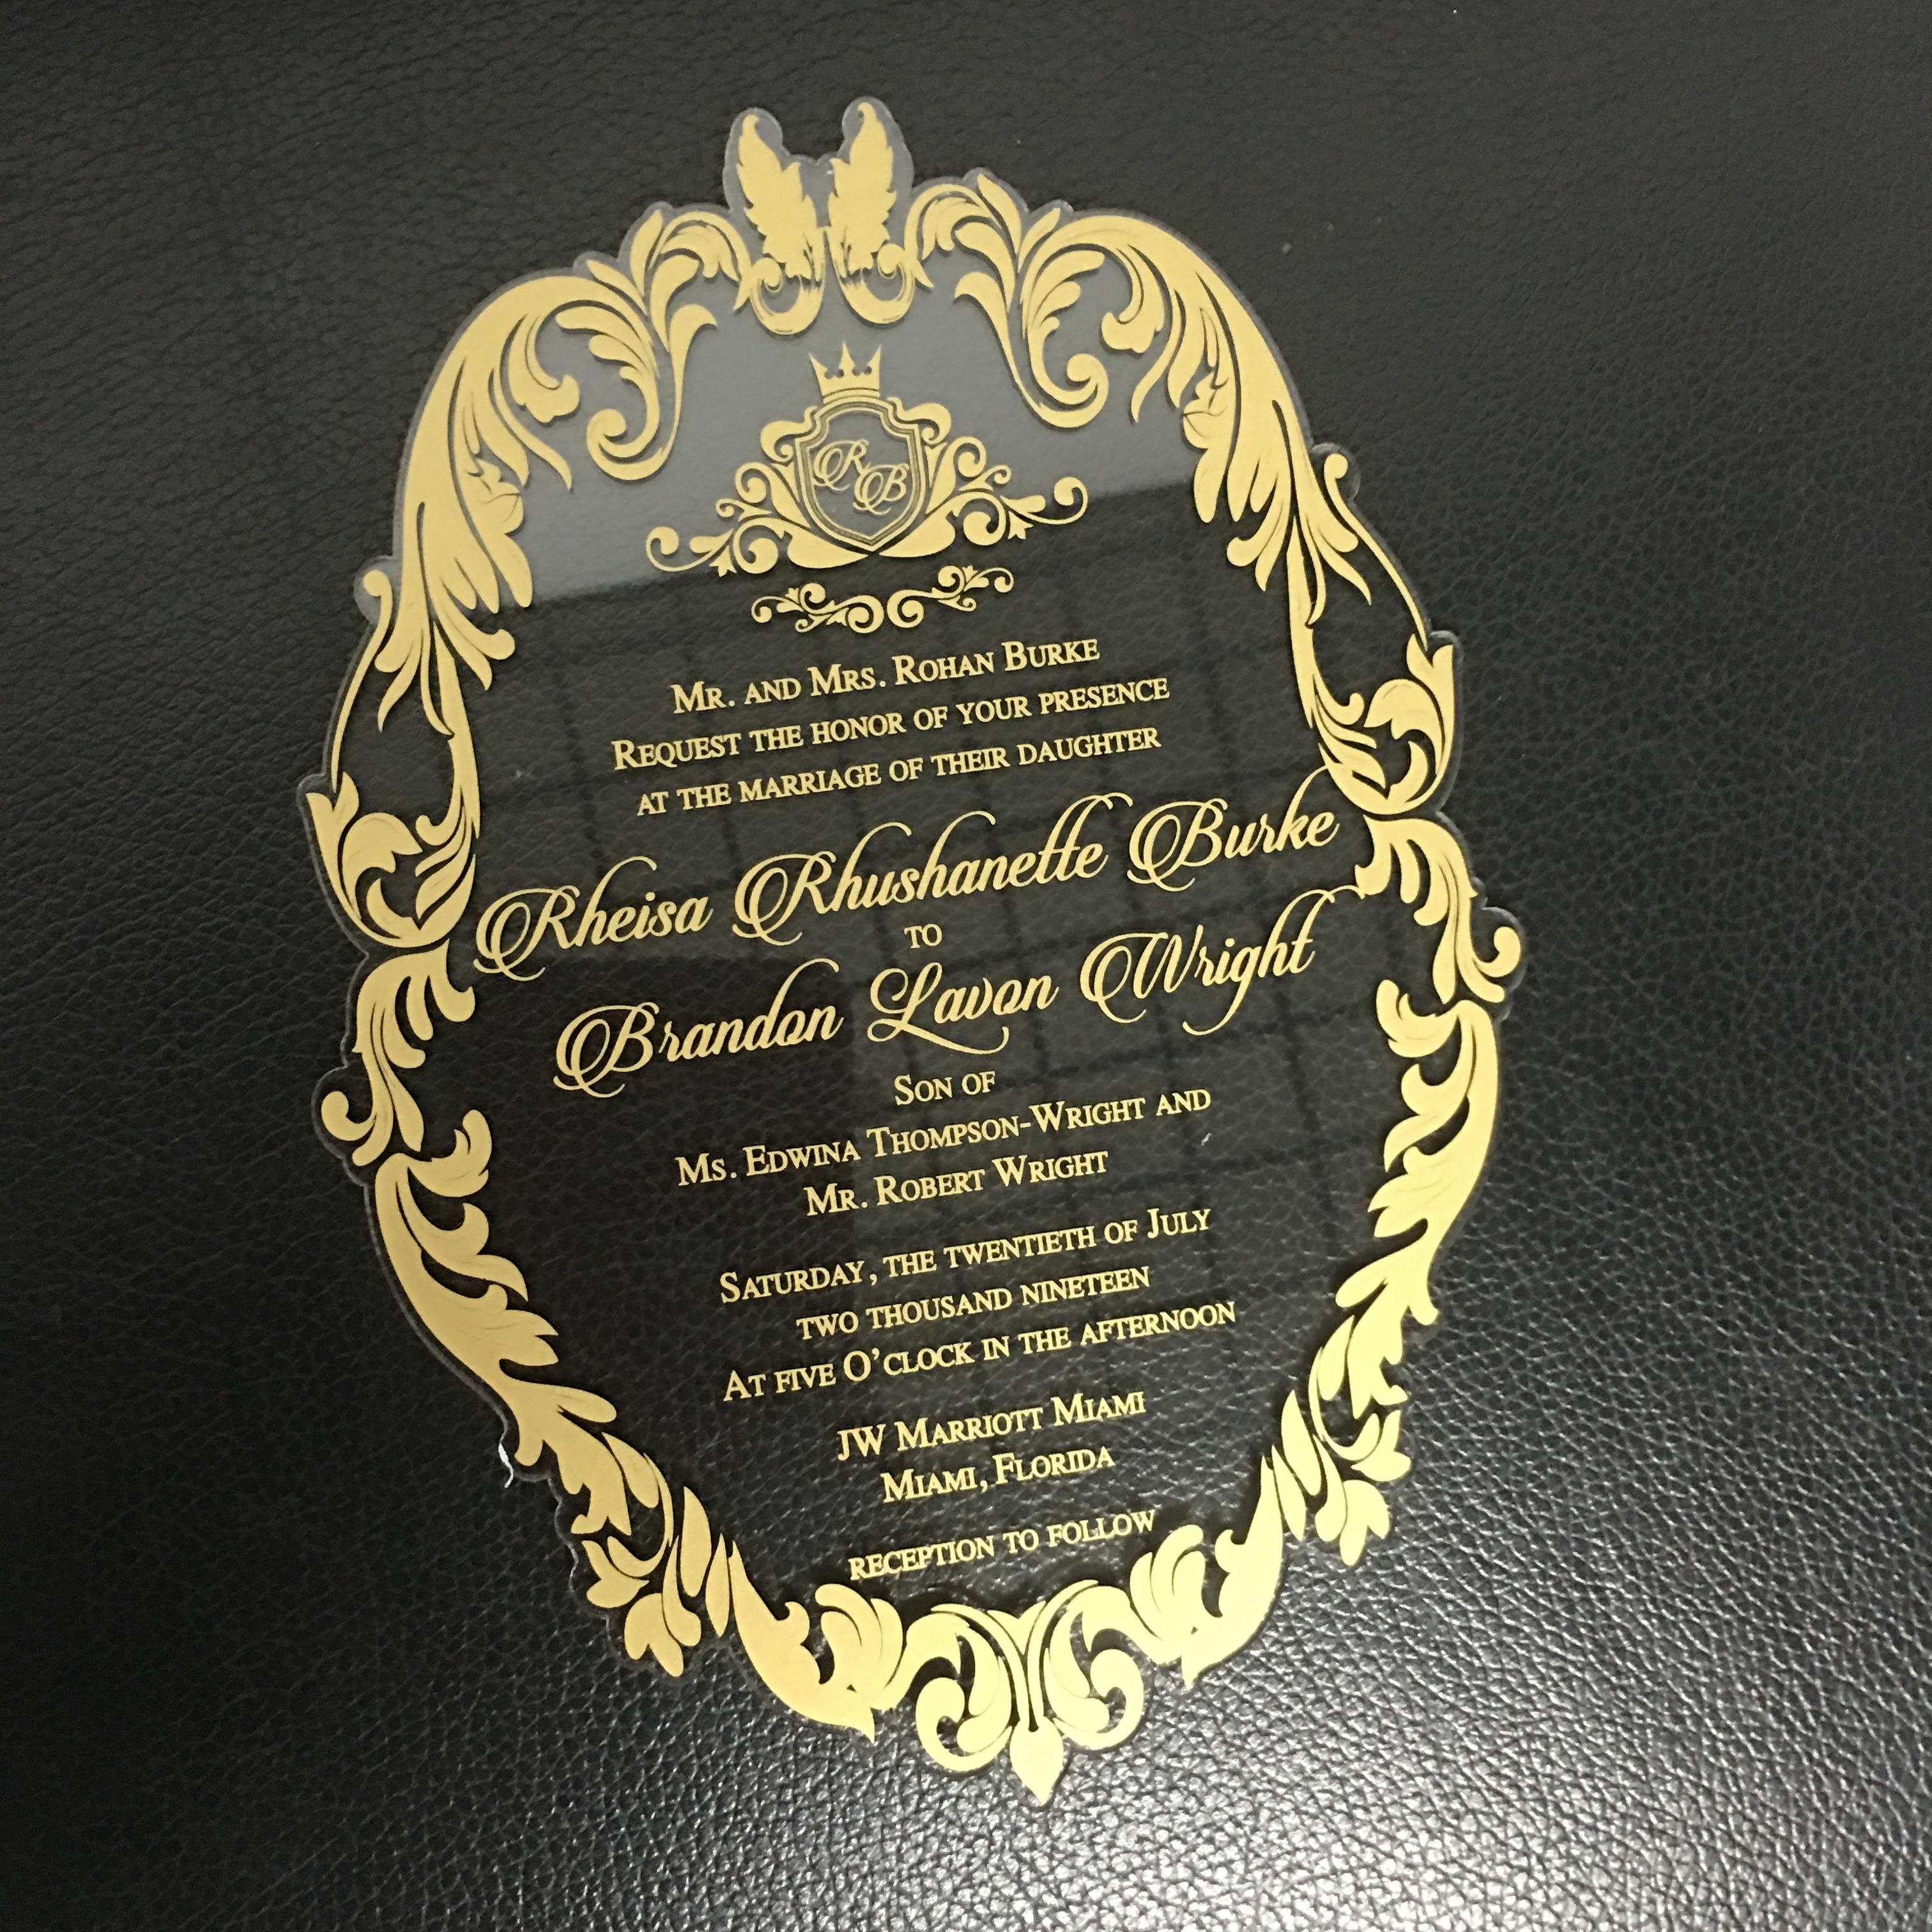 10pcs 2020 hot sell laser cut wedding invitation card making popular lace invitation  card cover Wedding Card Boxes  - AliExpress